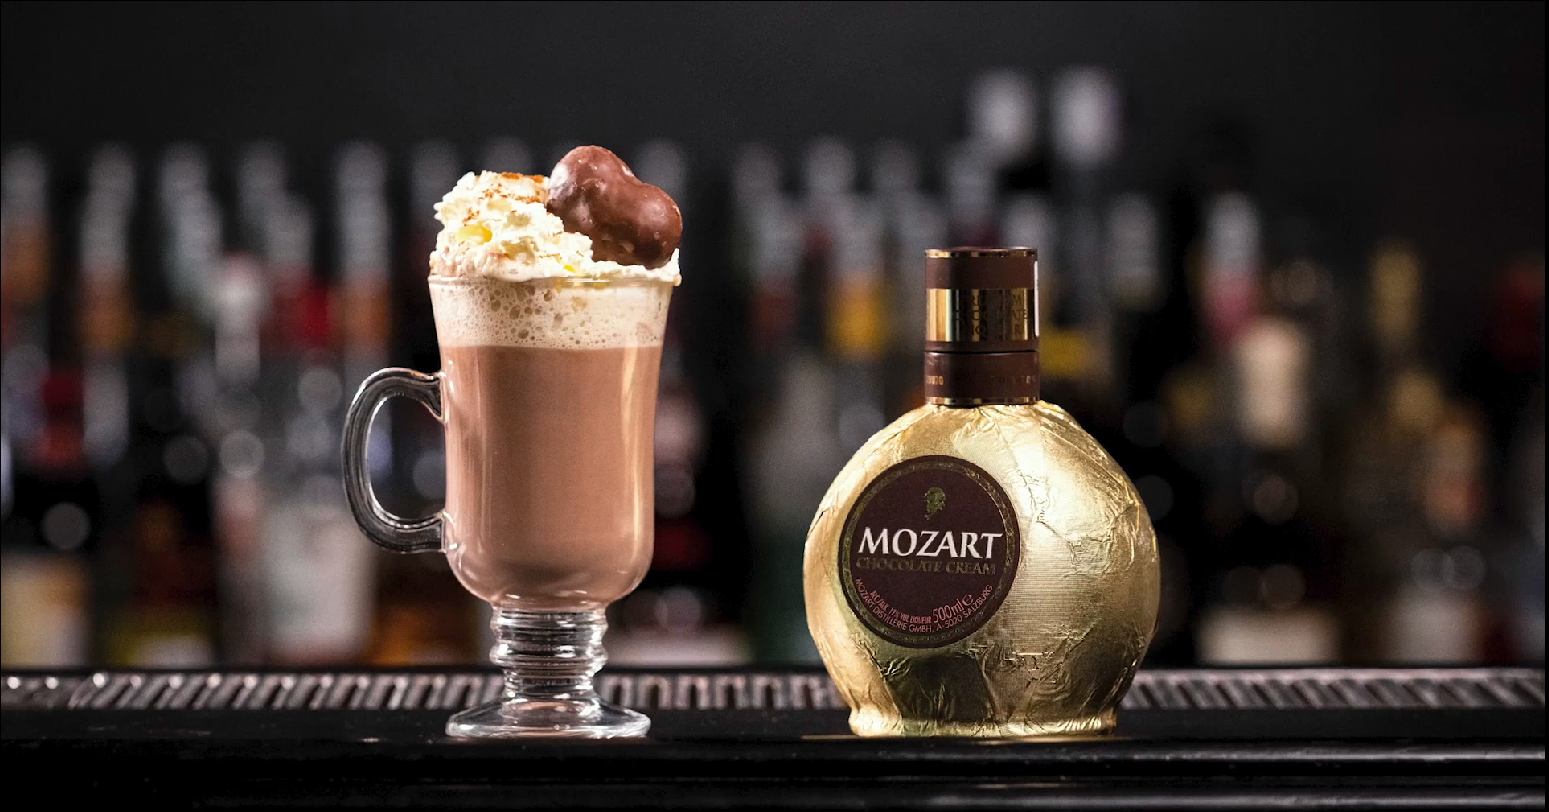 Mozart Gingerbread Hot Chocolate